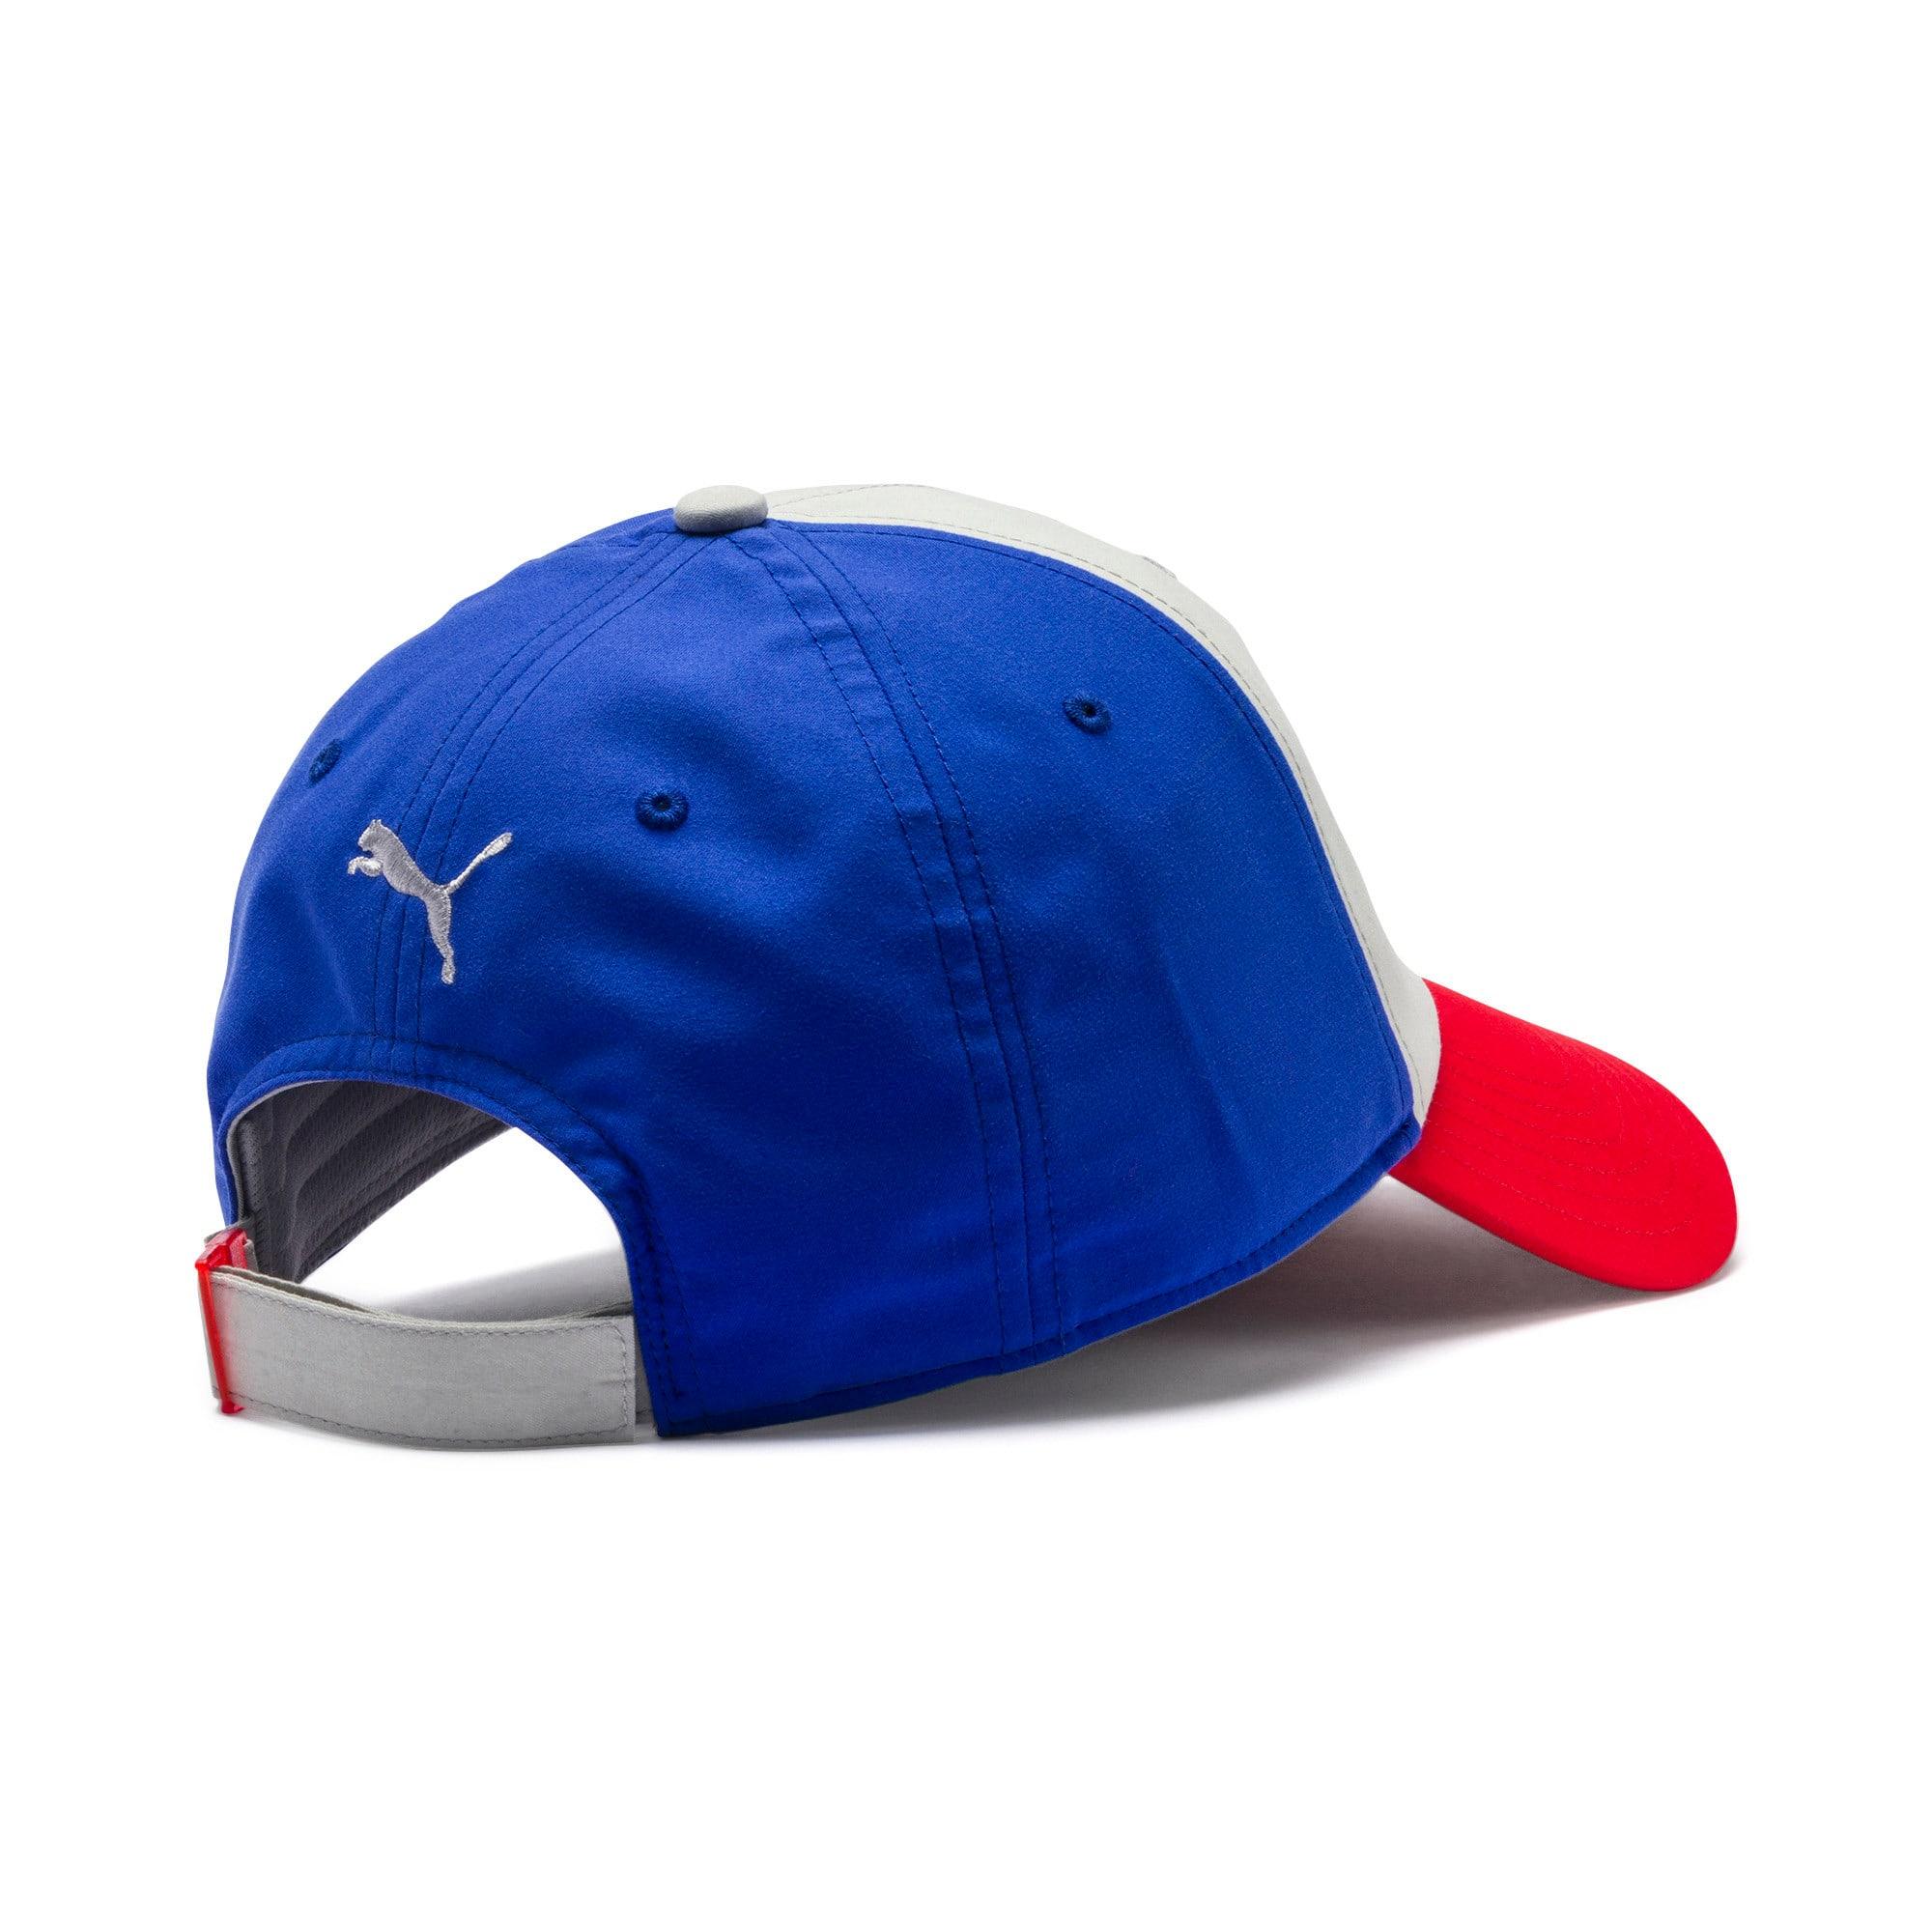 Thumbnail 2 of PUMA x TRANSFORMERS Baseball Cap, Gray Violet-Dazzling Blue, medium